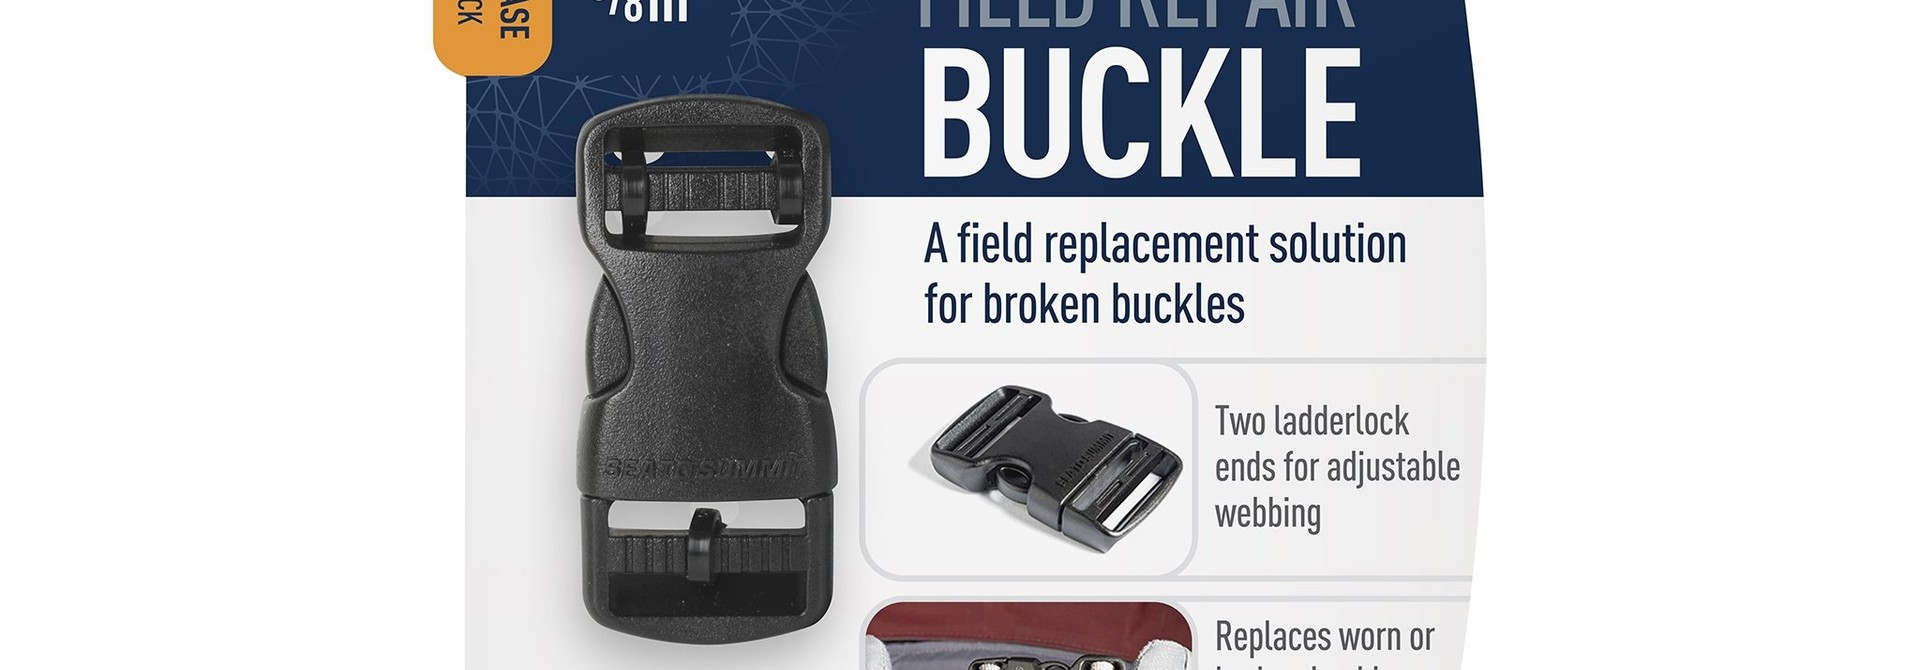 "Field Repair Buckle 15mm / 5/8"" Side Release 2 Ladderlock"